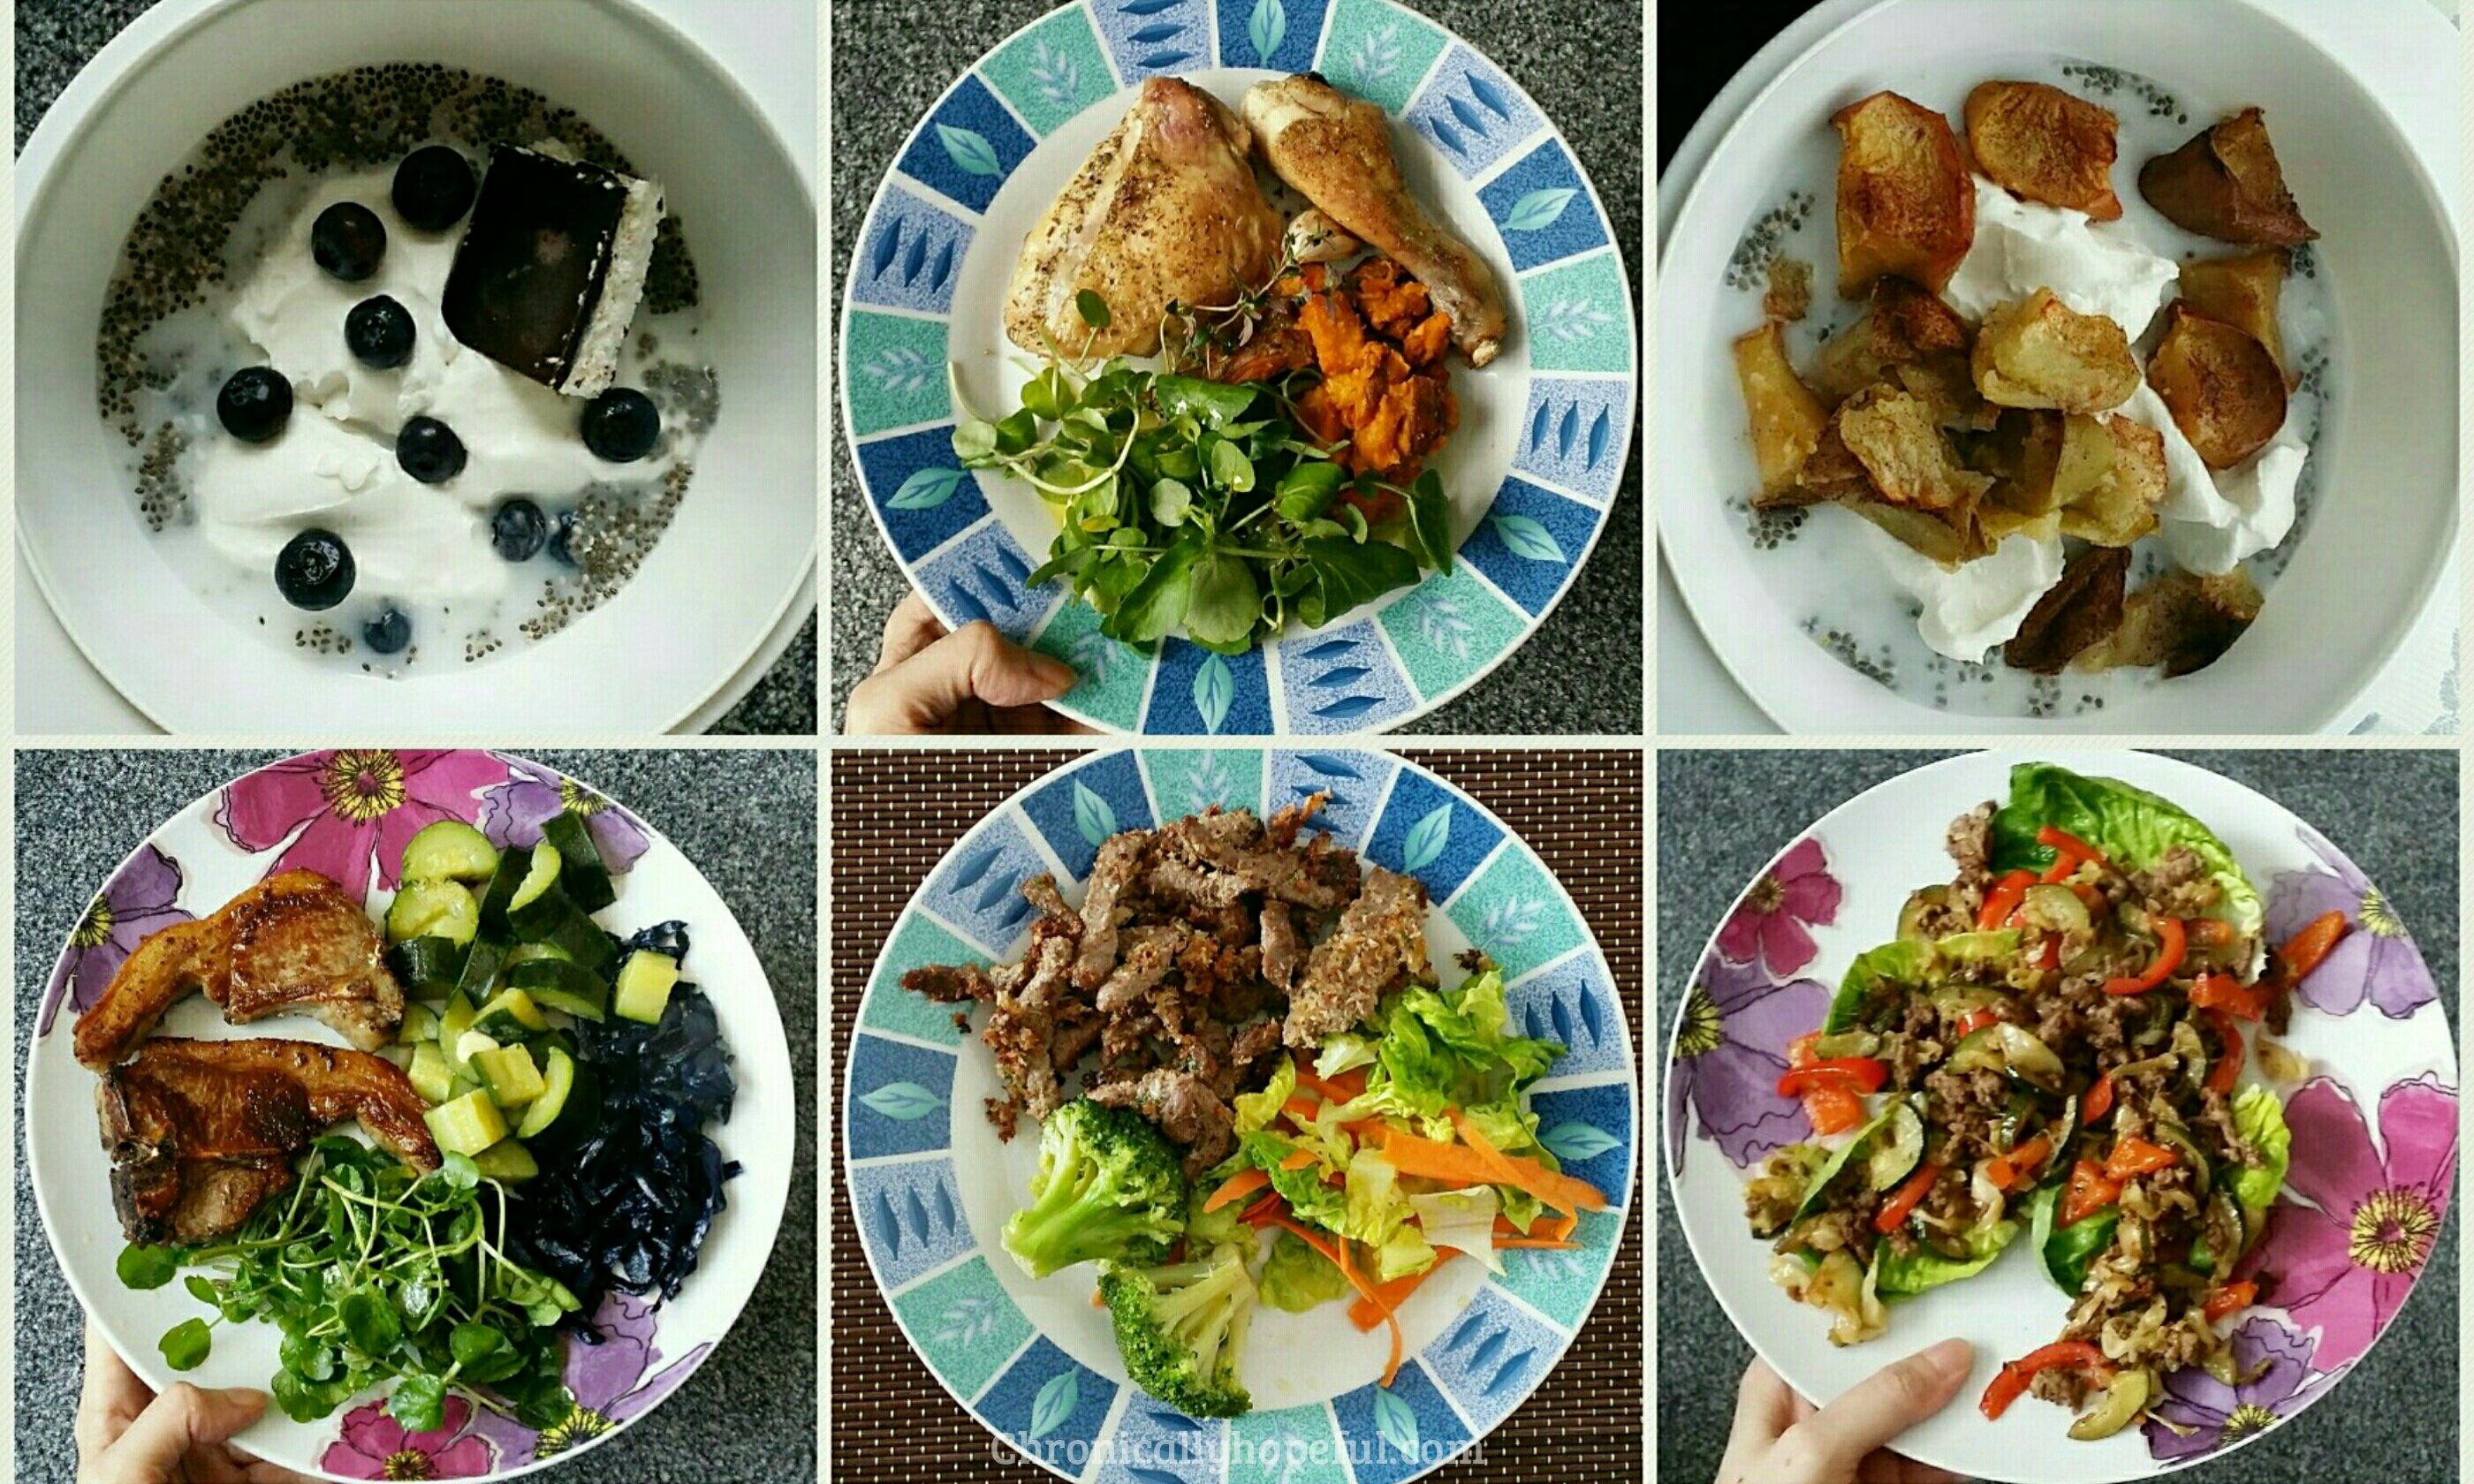 Sept 2017 meal ideas